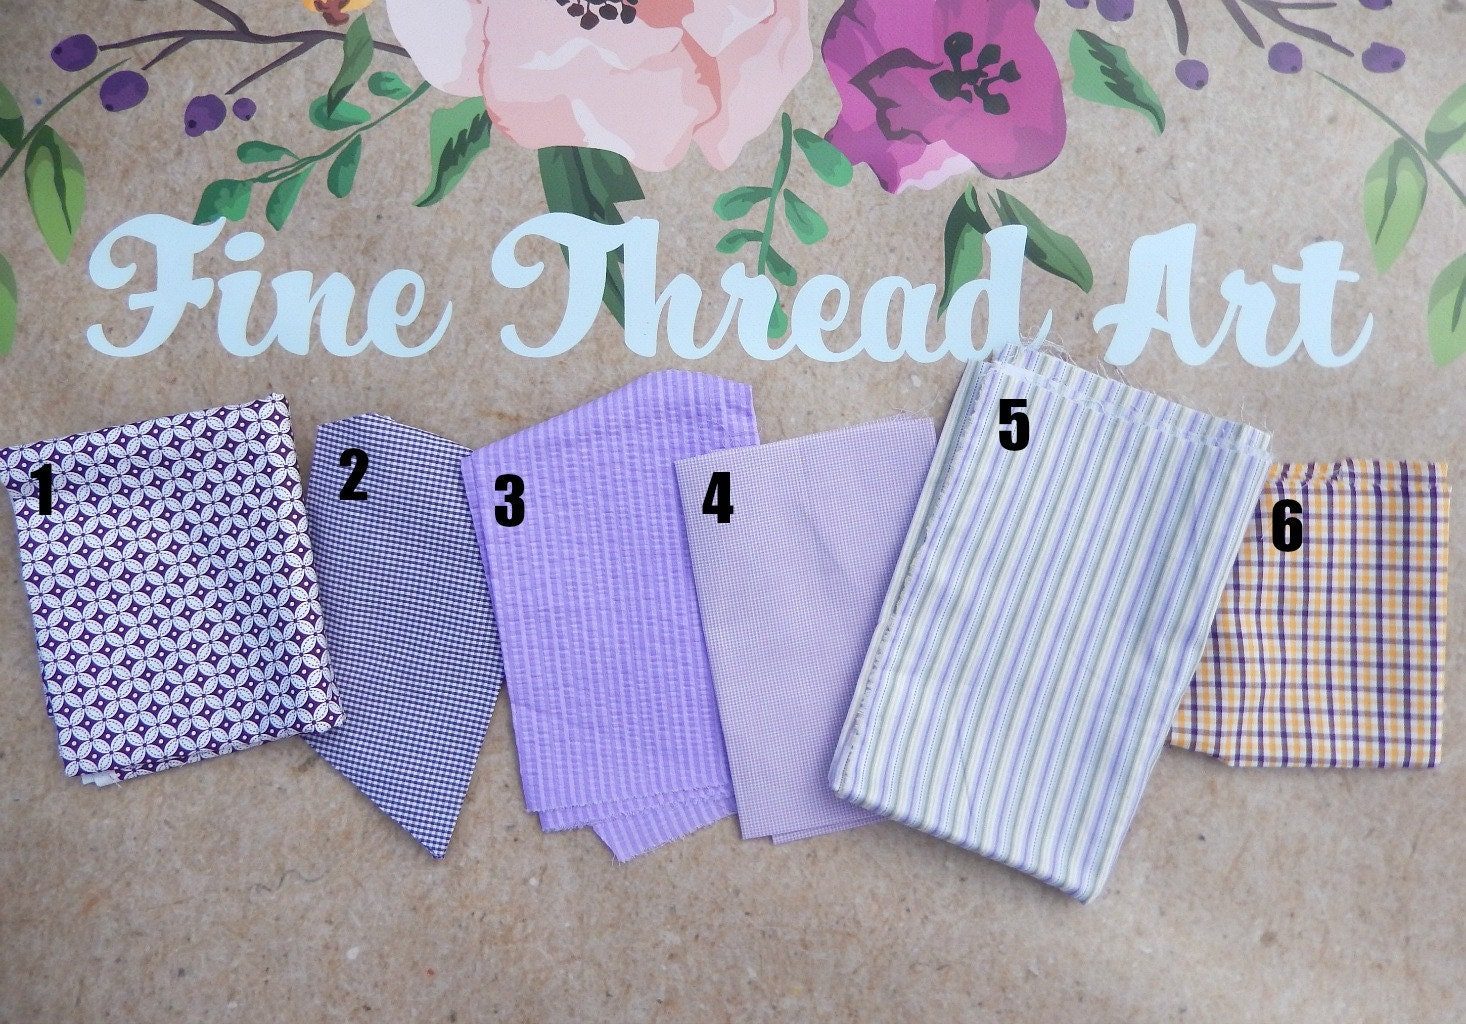 Purple and Lavender Applique Fabrics